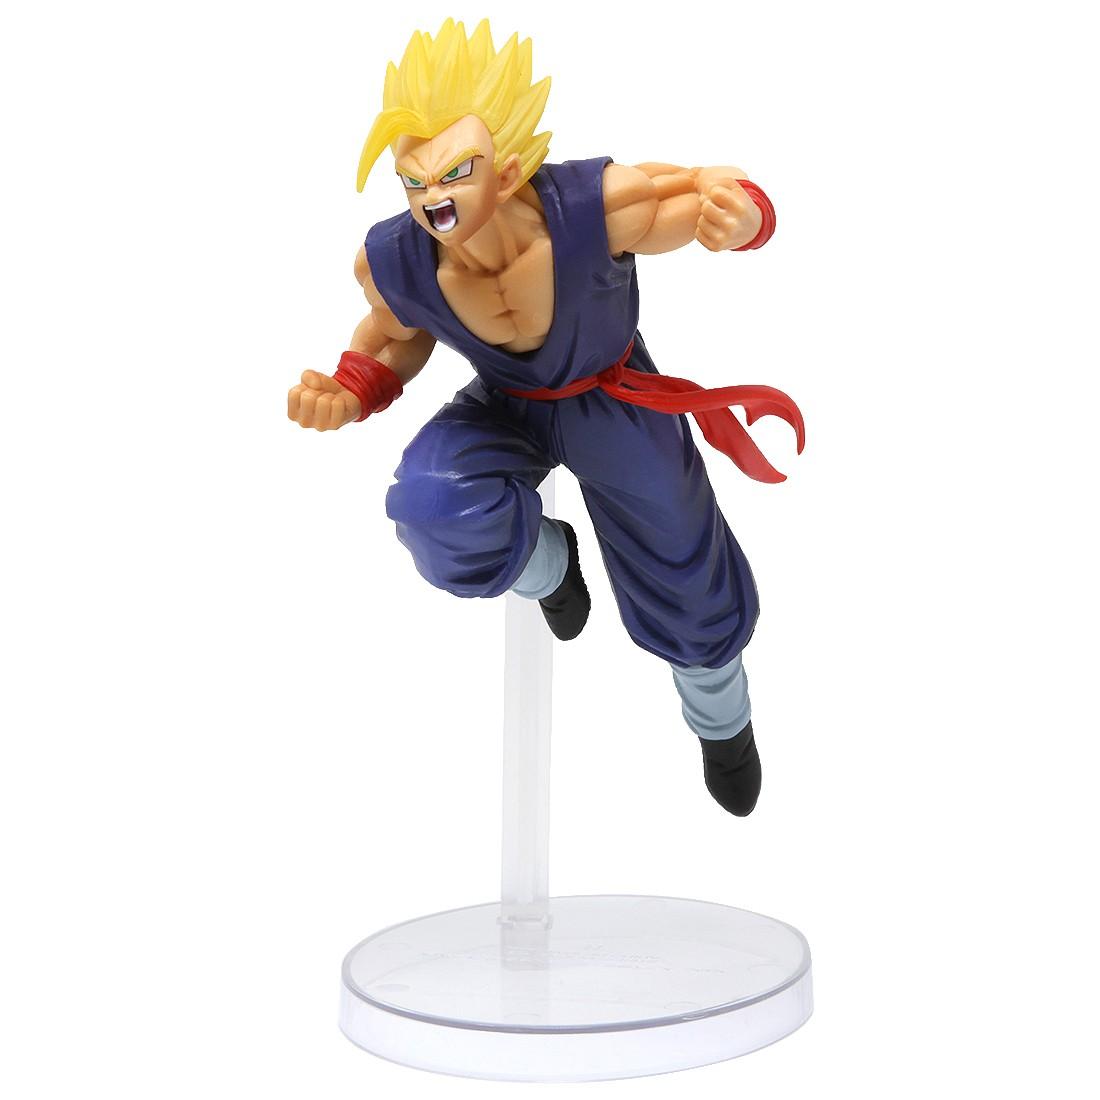 Super Sayian Son Gohan Ichiban Figure